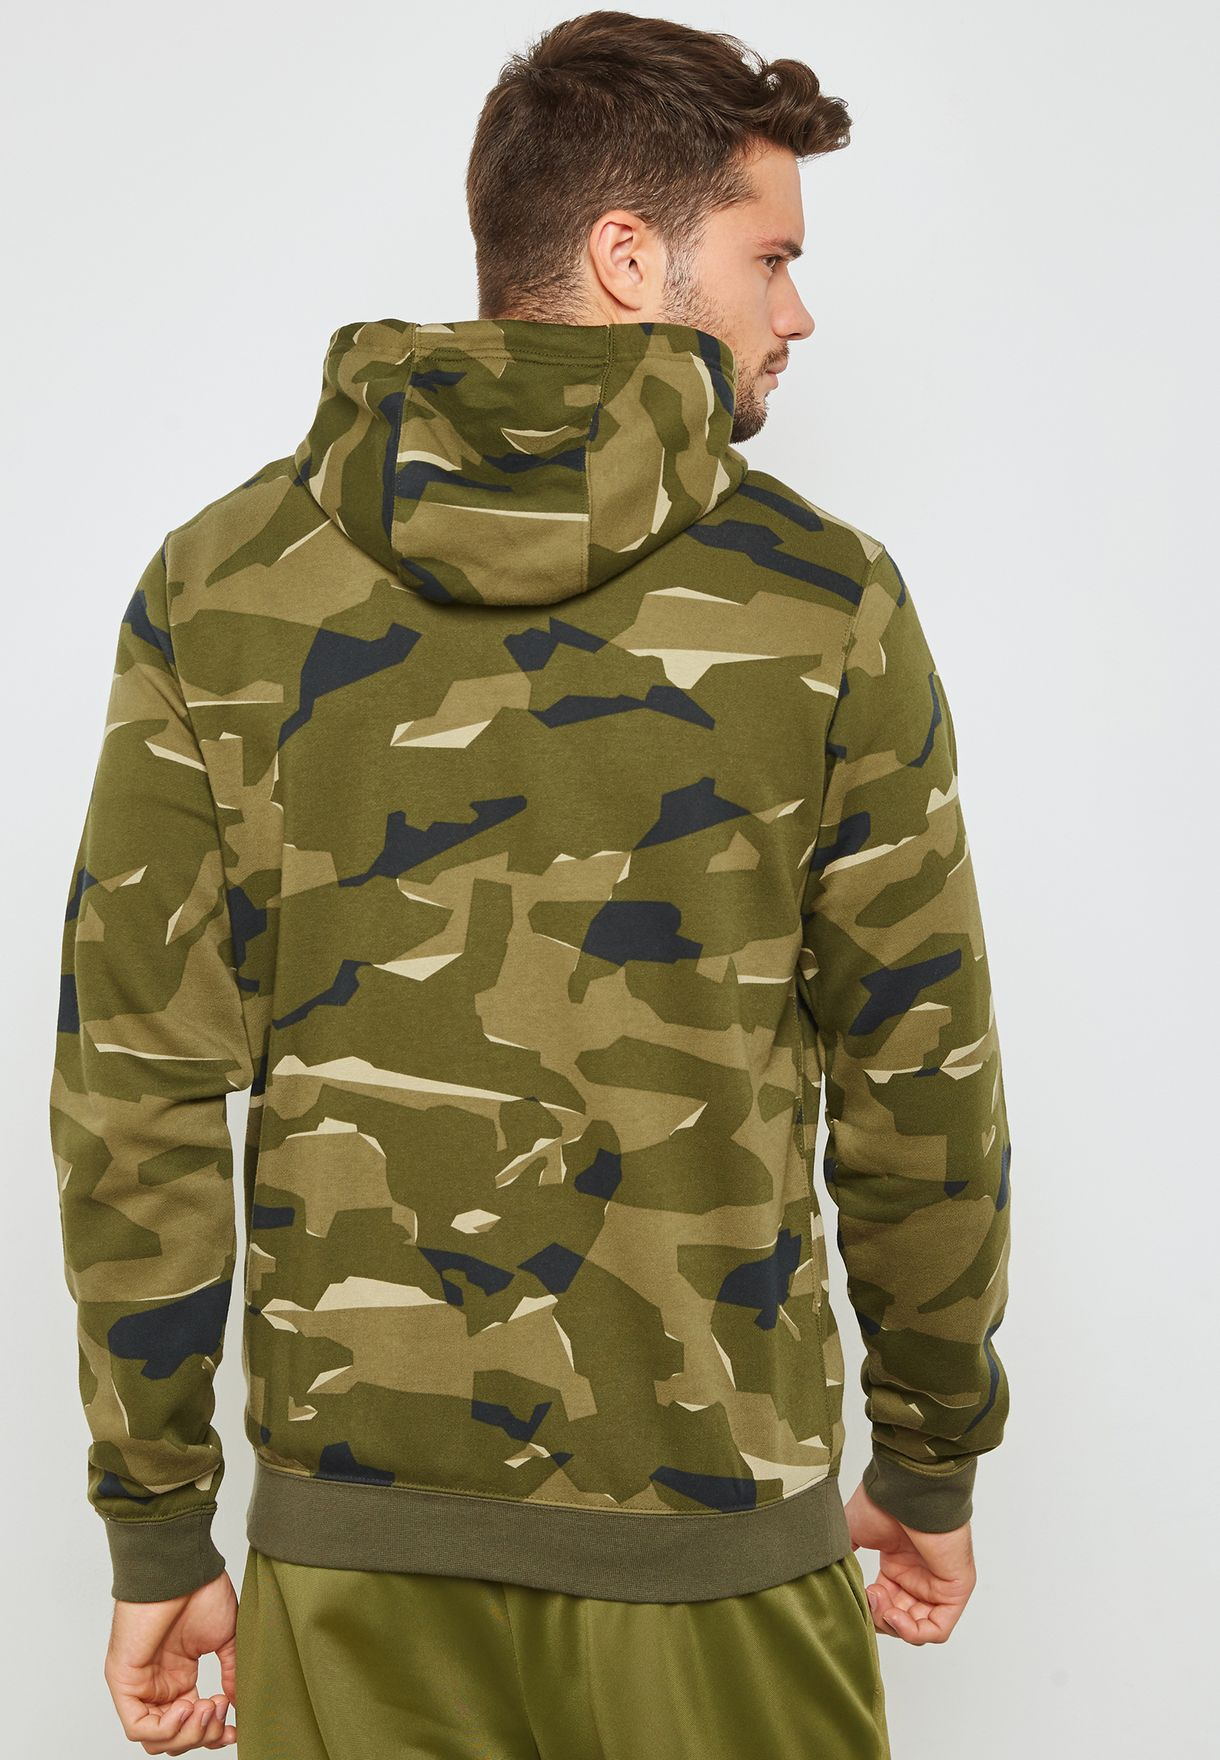 Bravepe Men Drawstring Sport Camo Pocket Front Hooded Hoodie Sweatshirt